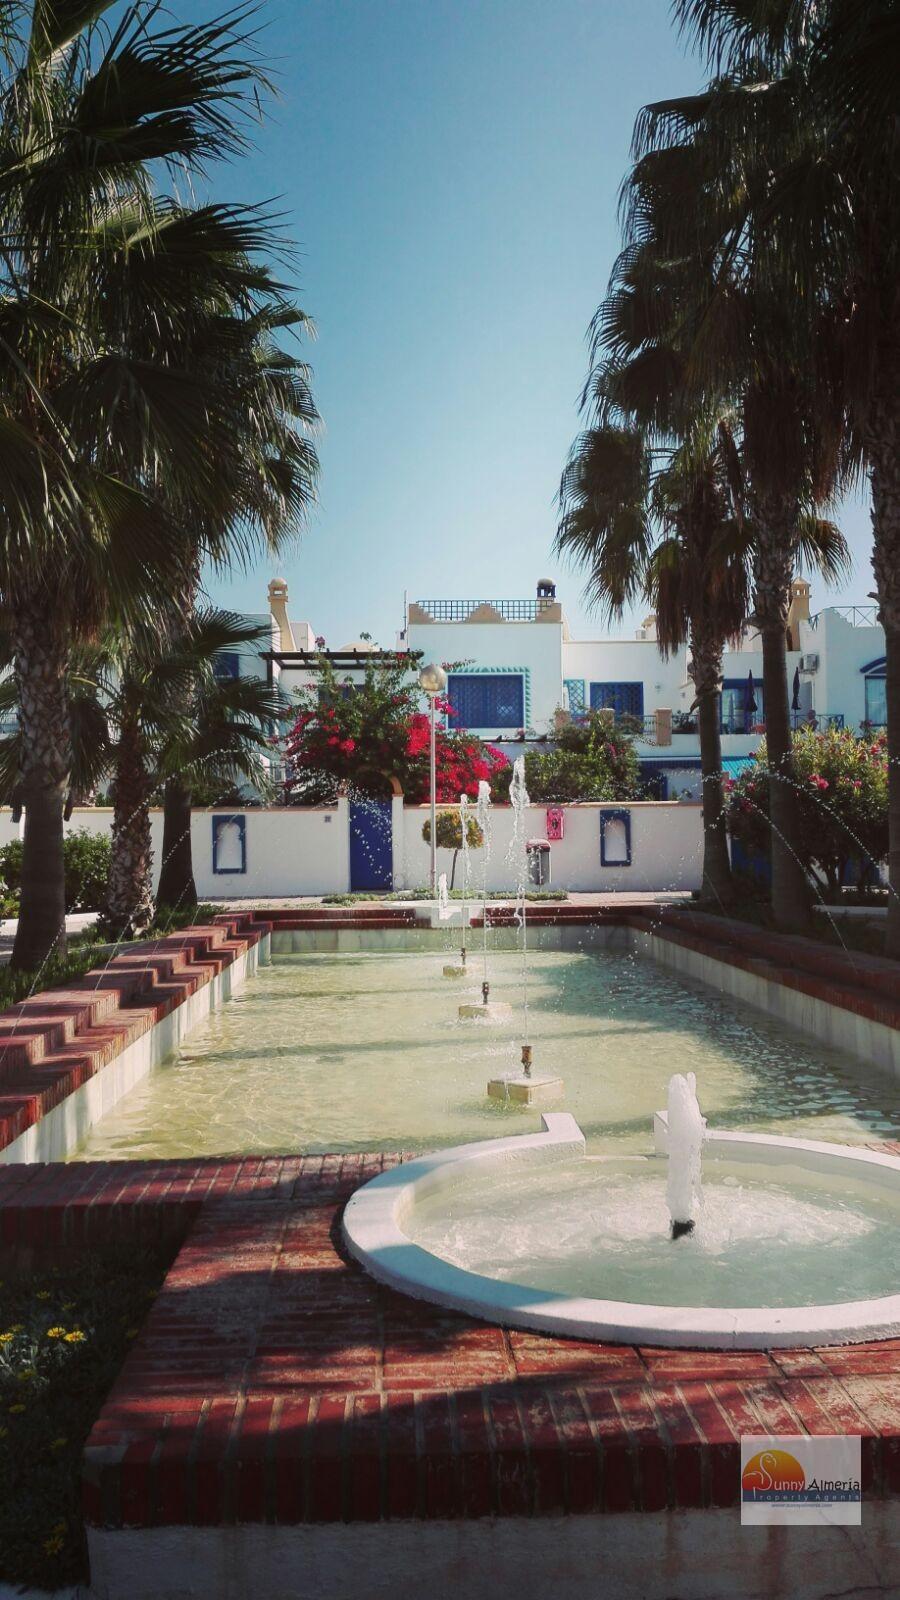 Apartment for sale in Avenida Entremares 8-12 (Roquetas de Mar), 84.000 €